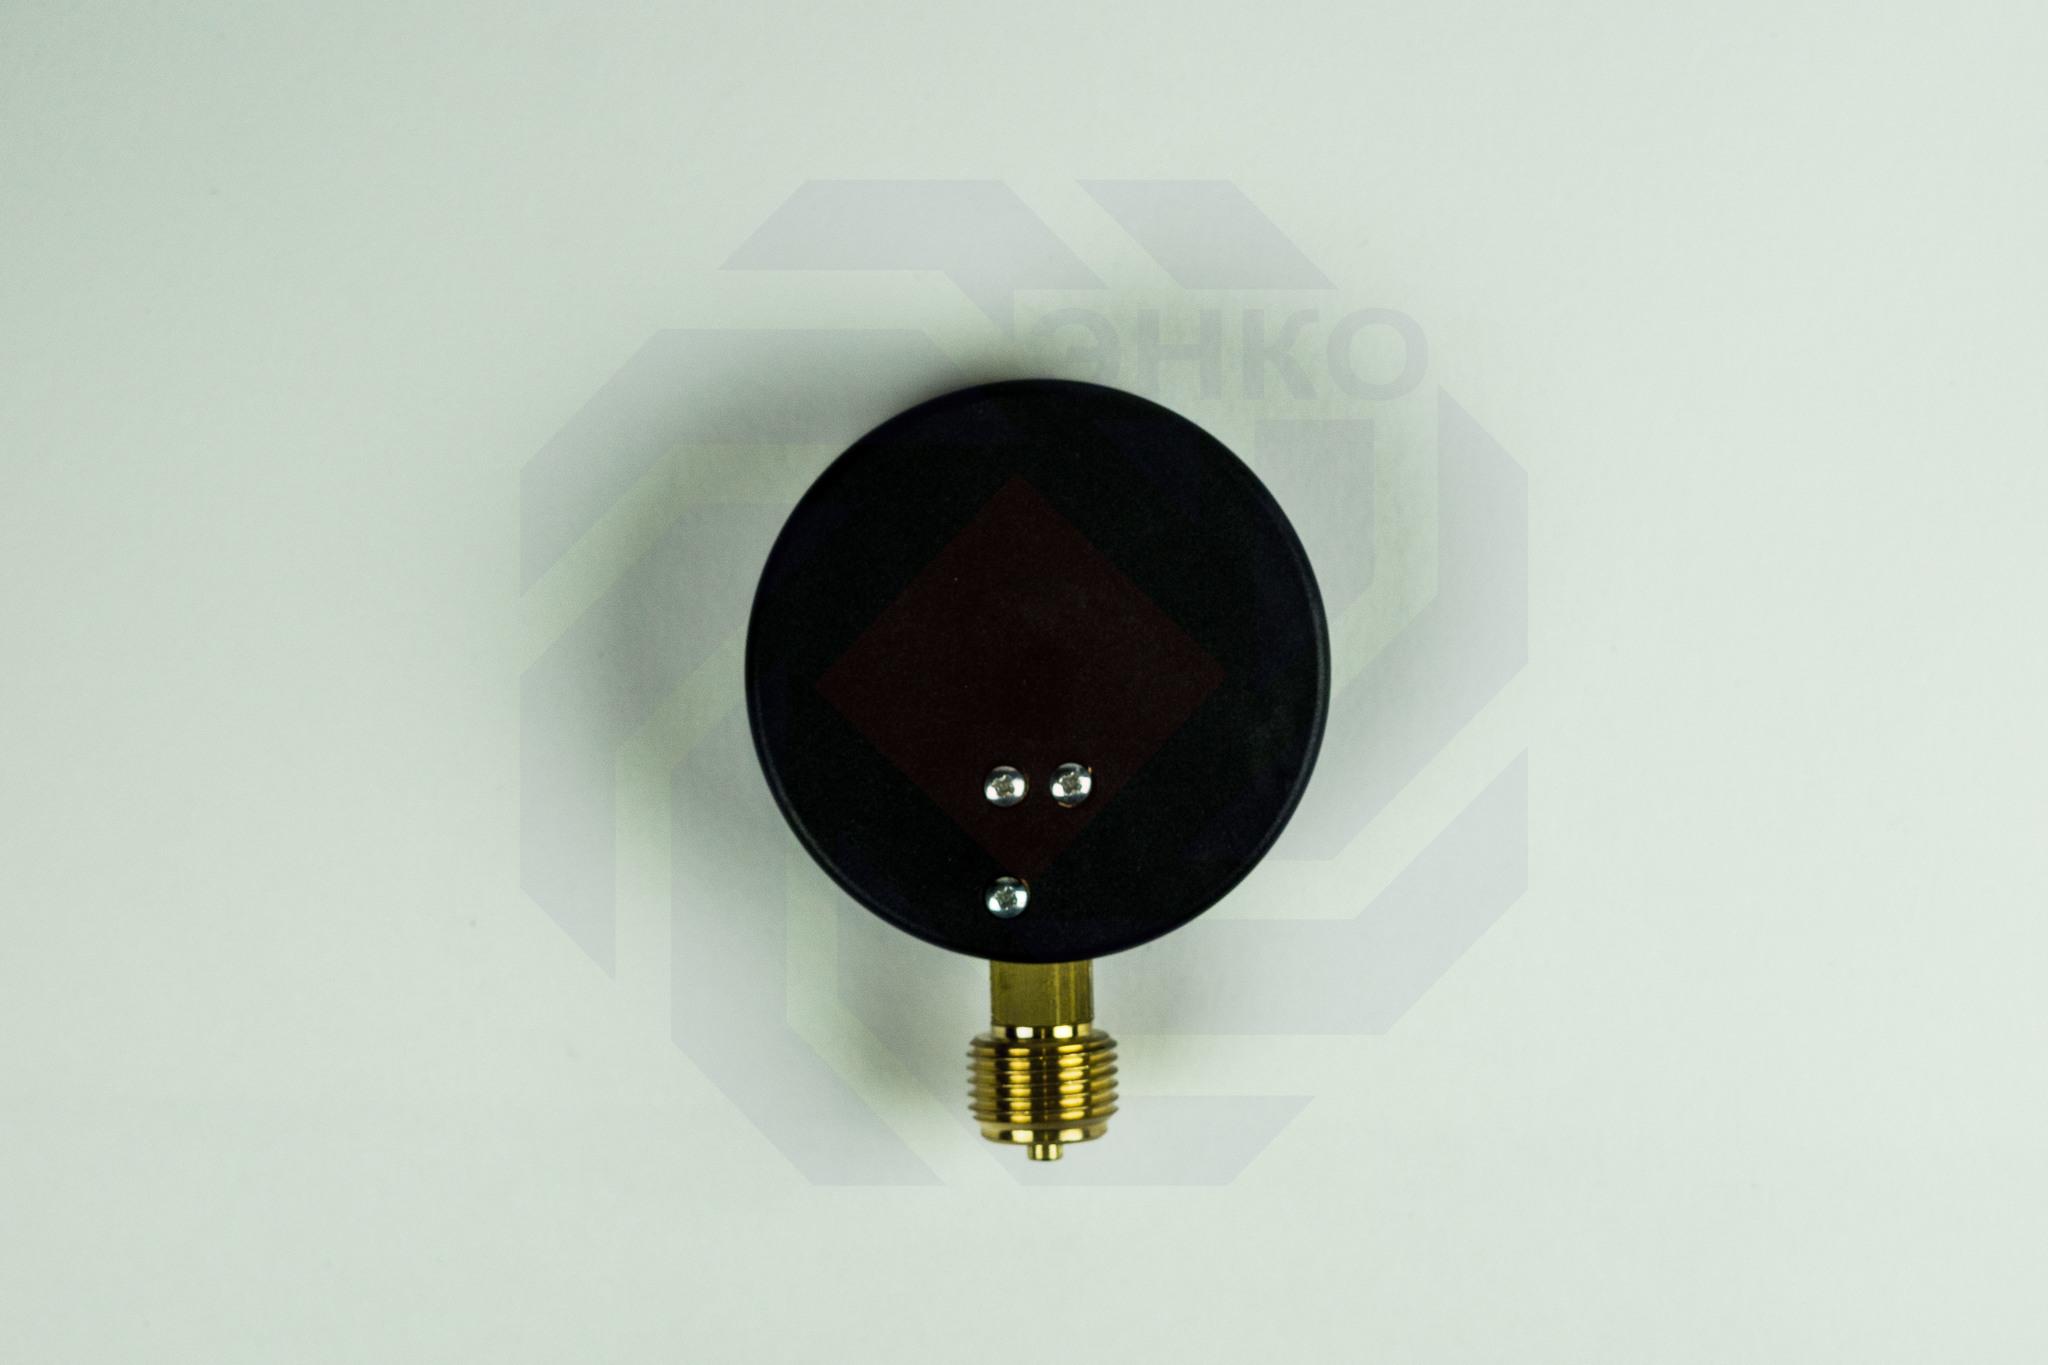 Манометр радиальный WATTS MDR 80/25 (F+R200) 0-25 бар 80 мм ½